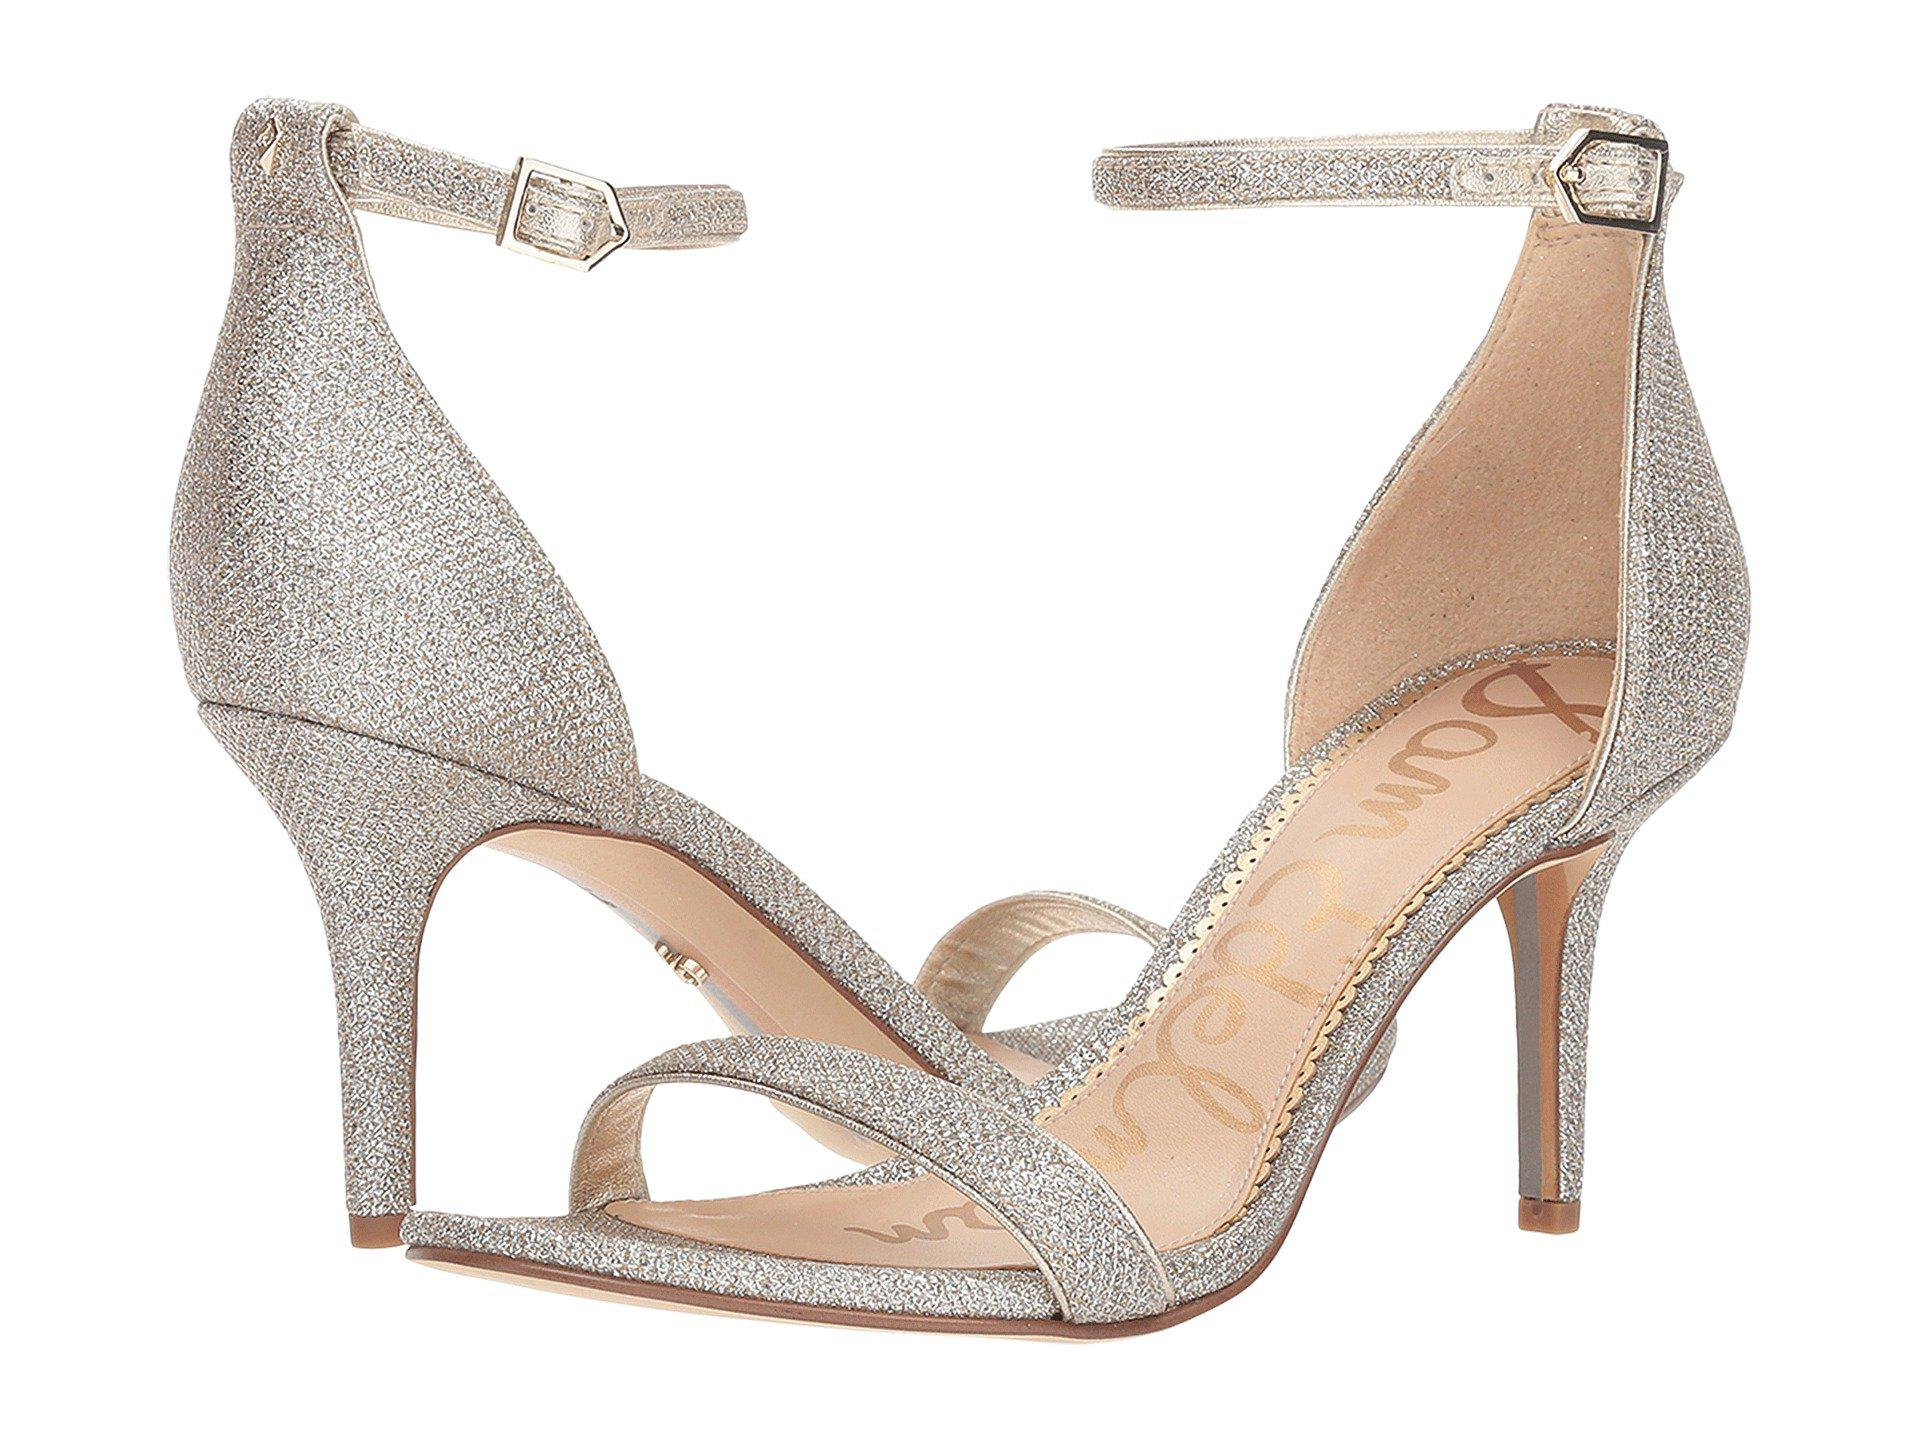 959d26823 Lyst - Sam Edelman Patti Dress Sandal in Metallic - Save 41%